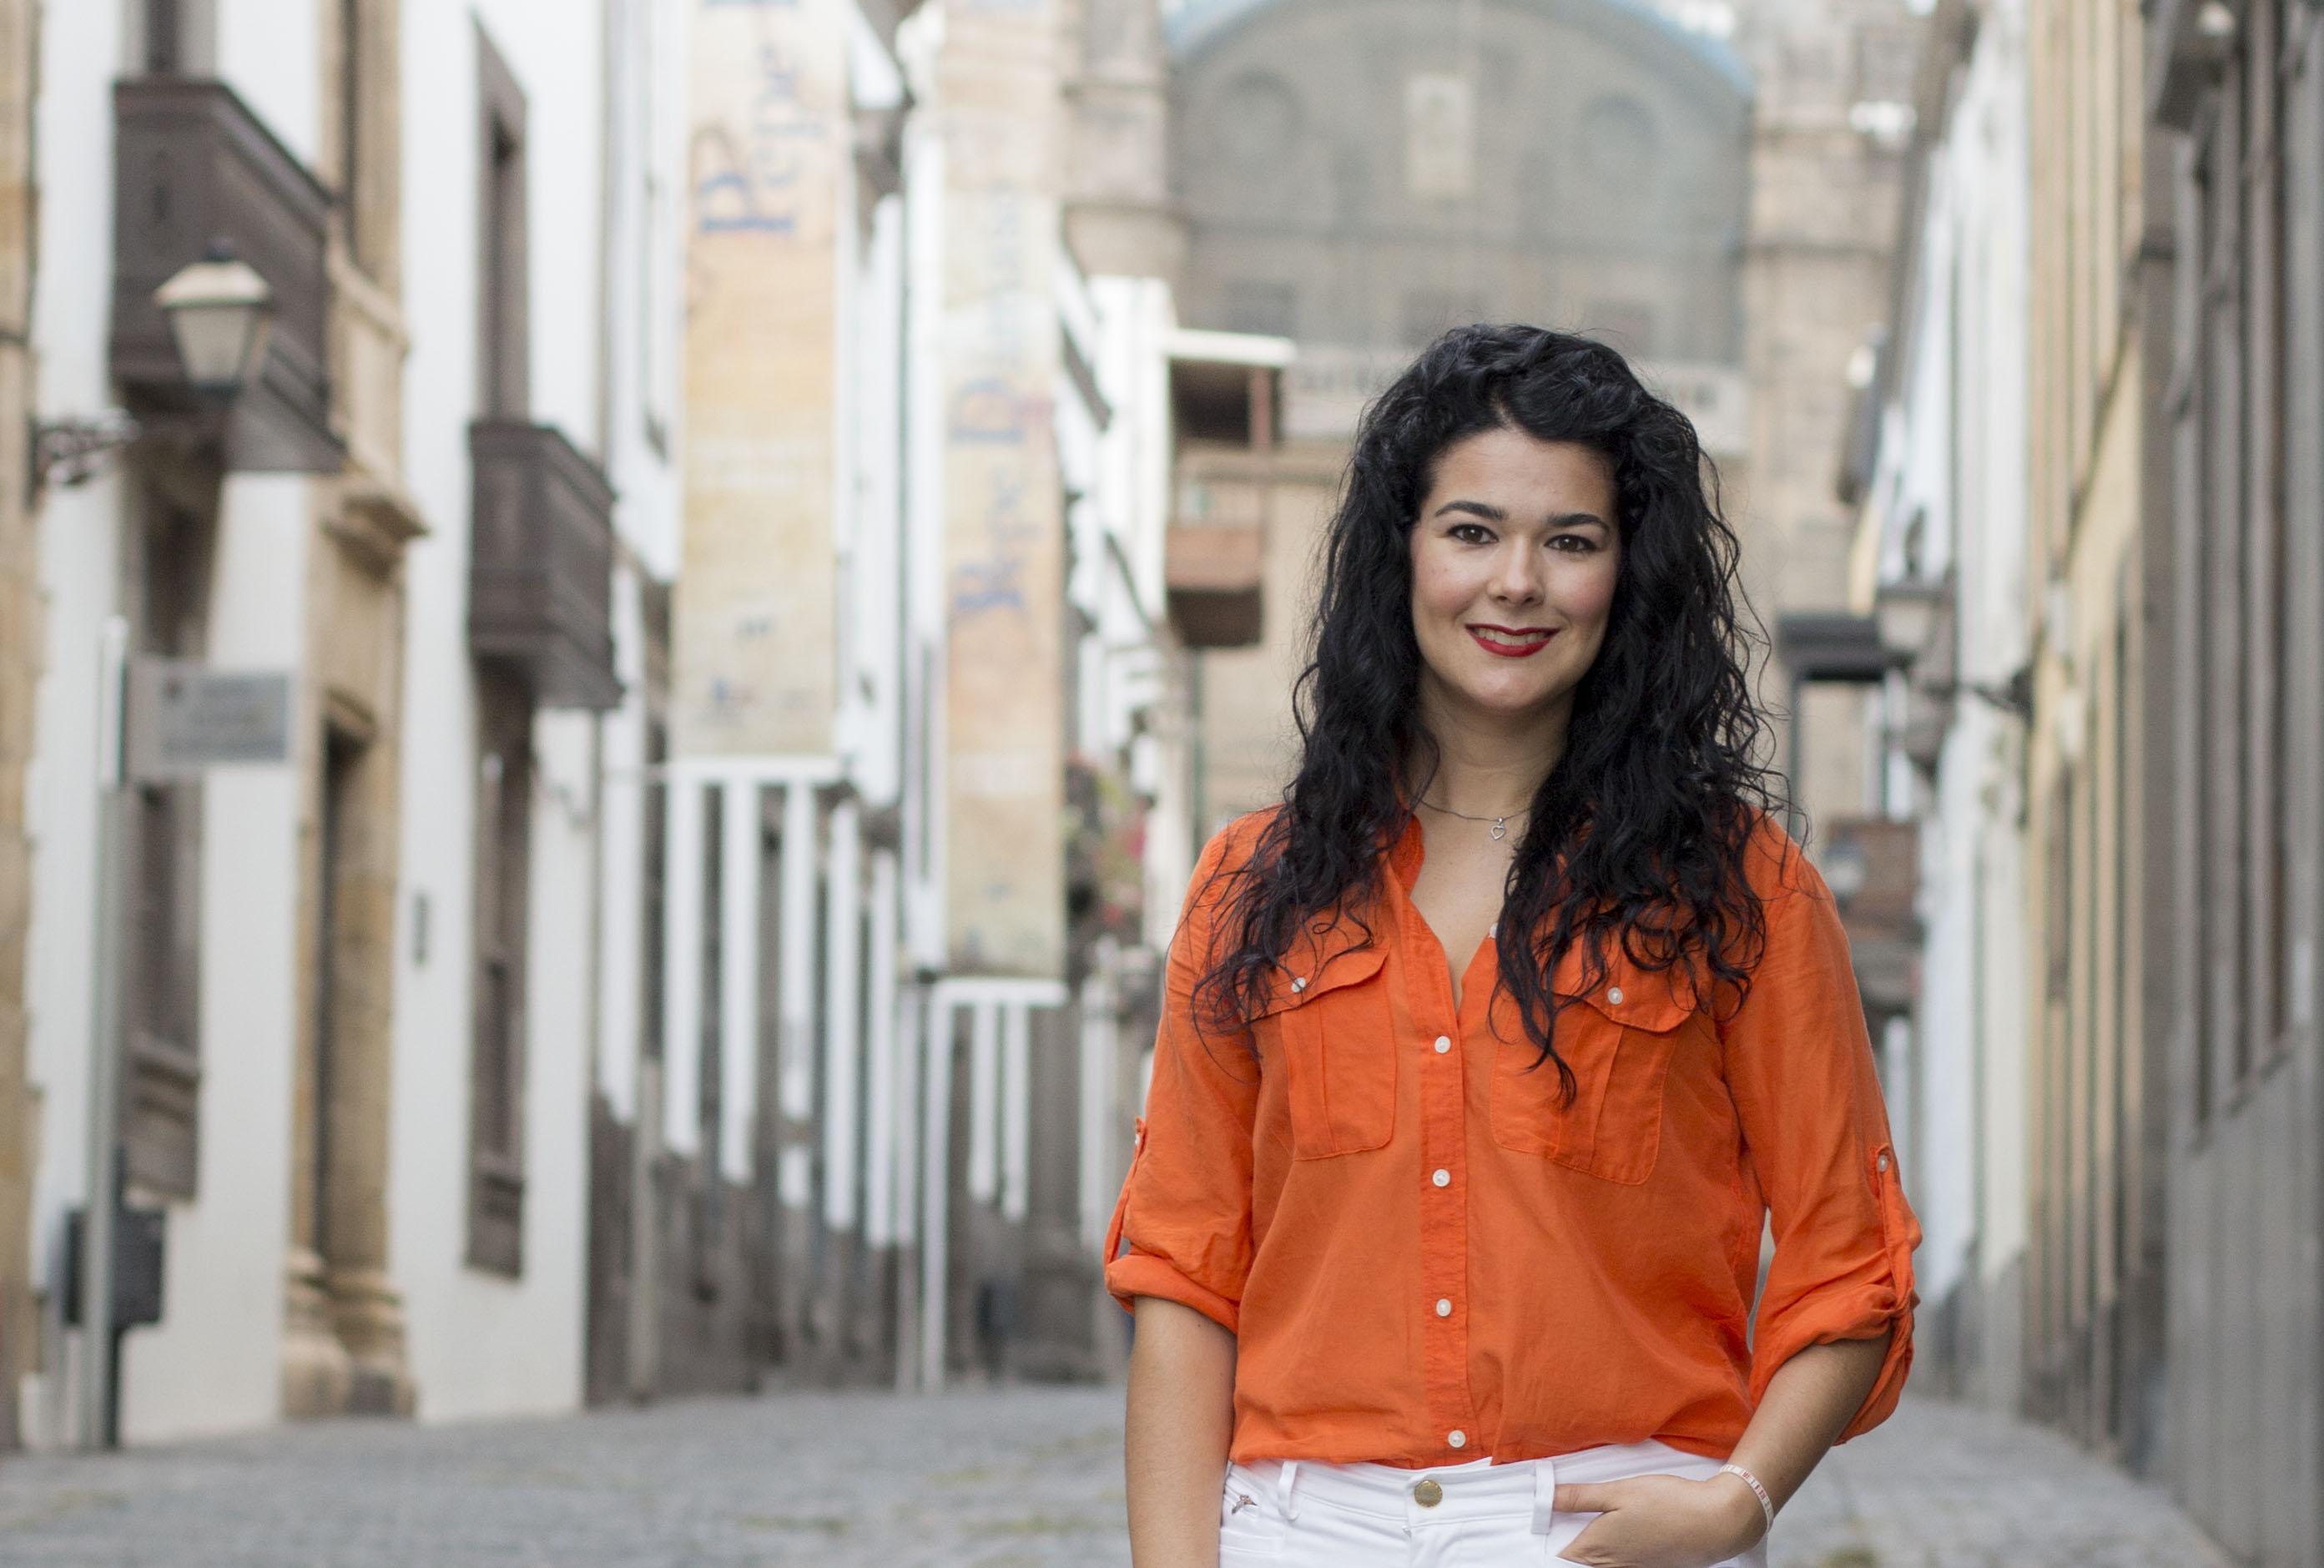 Veronica Alemán Gran Canaria Natural & Active